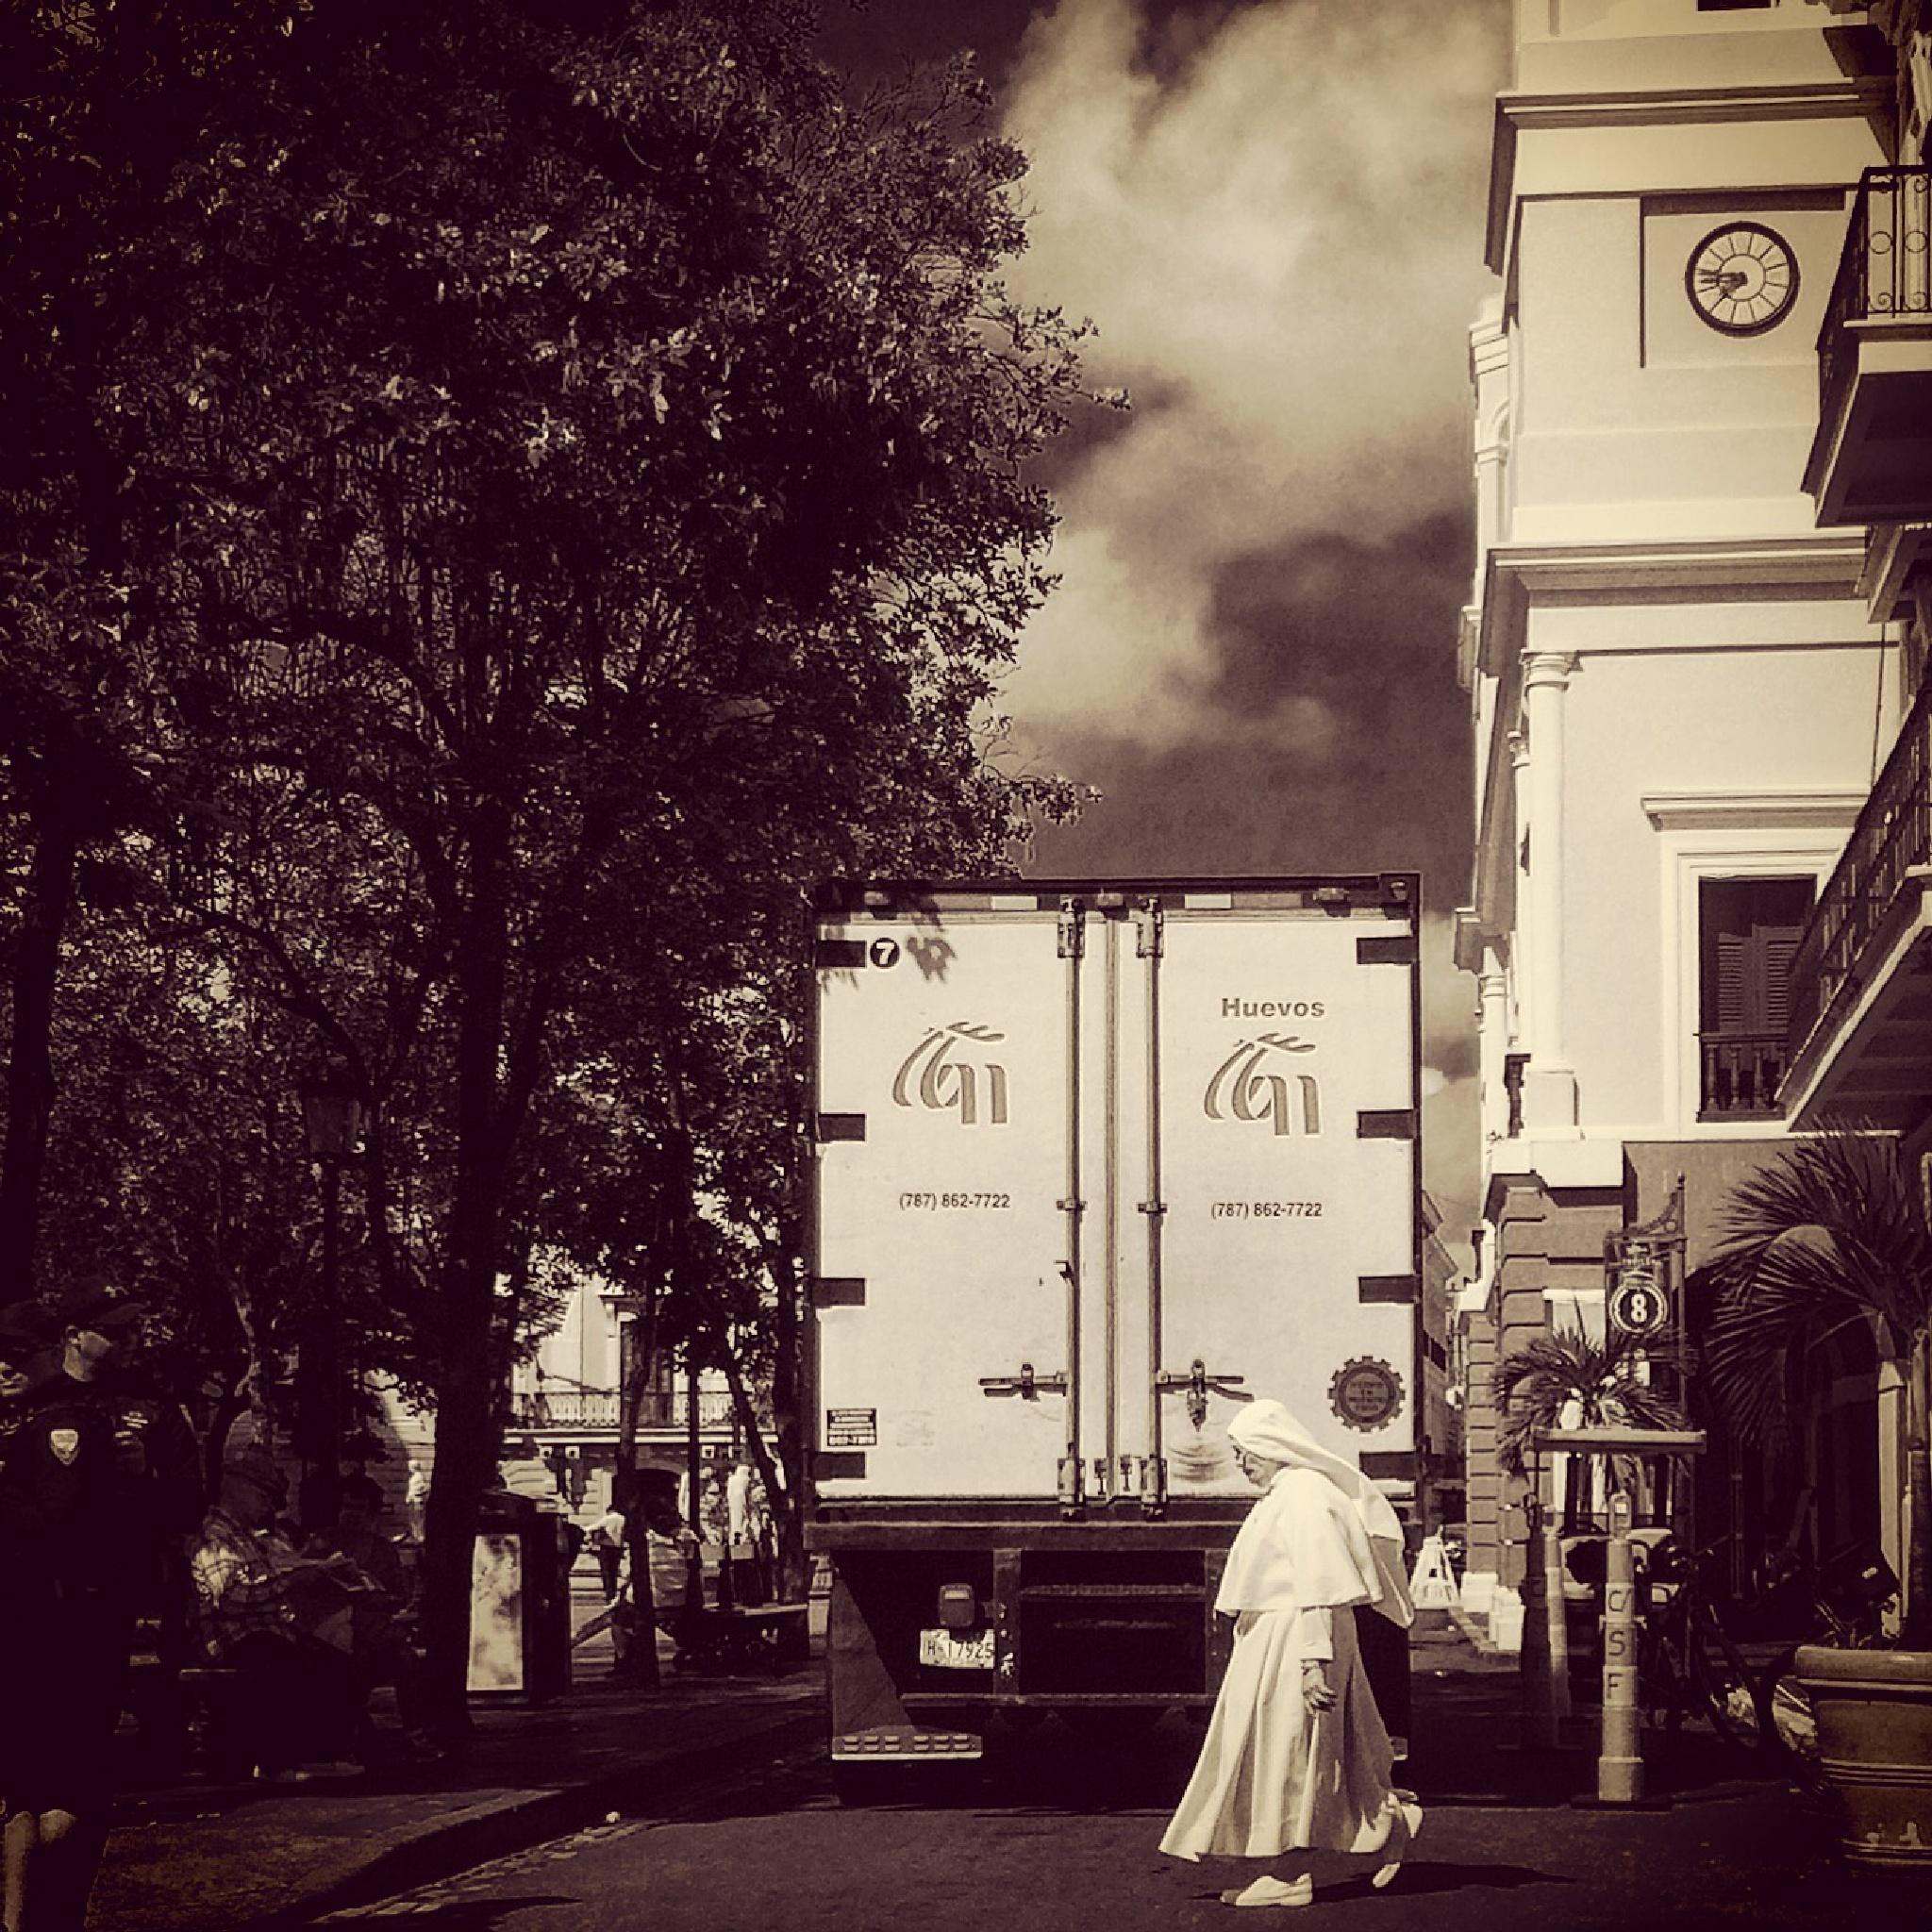 Nun crossing by Nilda64pr